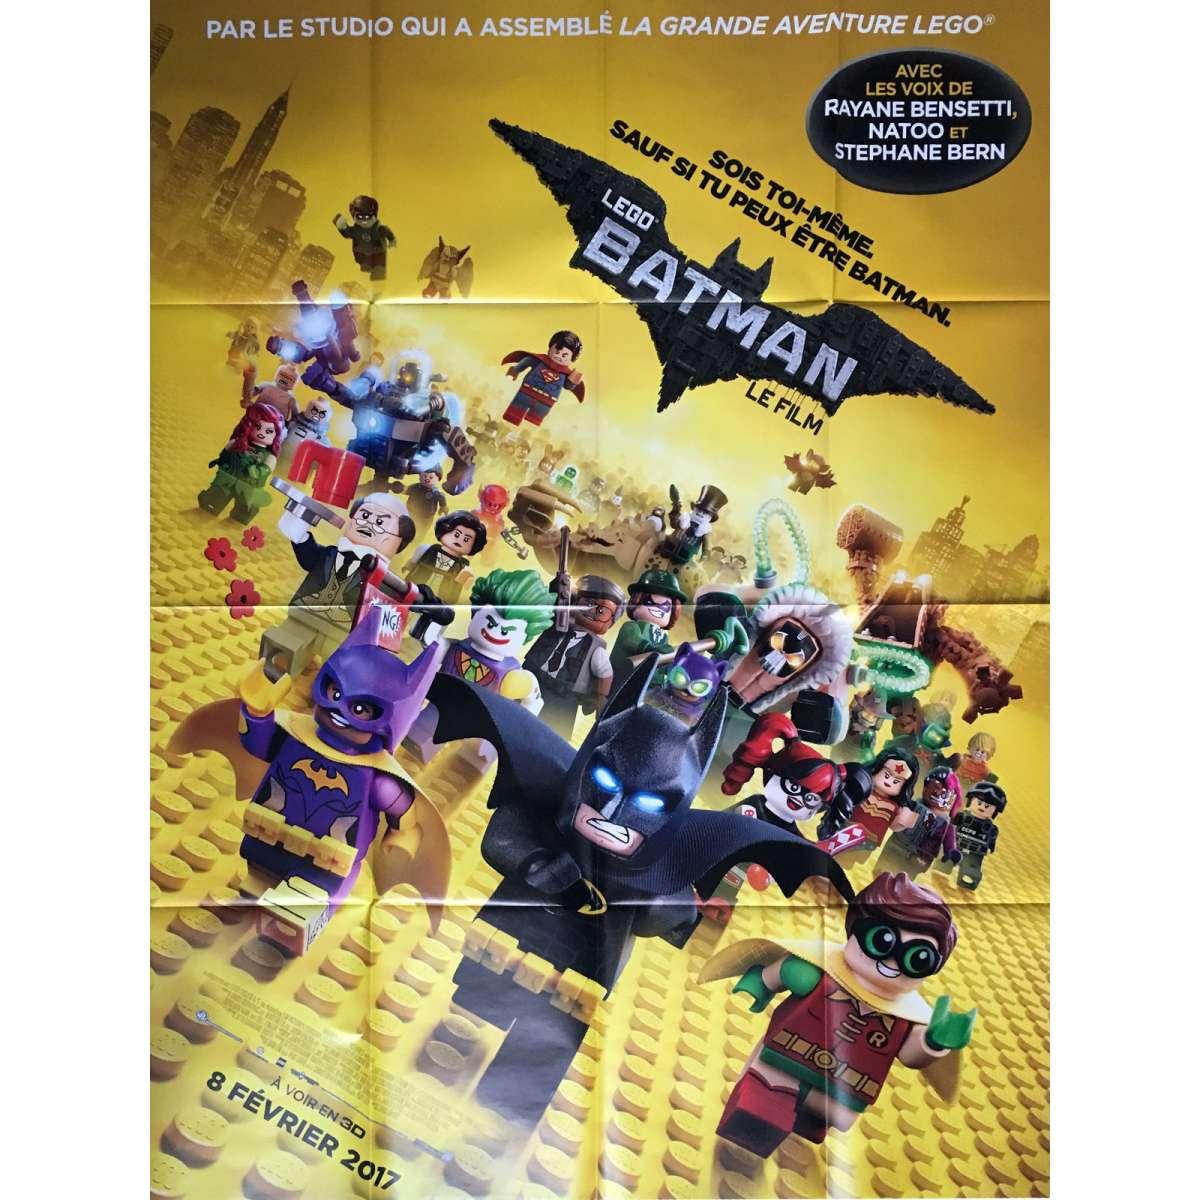 THE LEGO BATMAN MOVIE Movie Poster 47x63 In